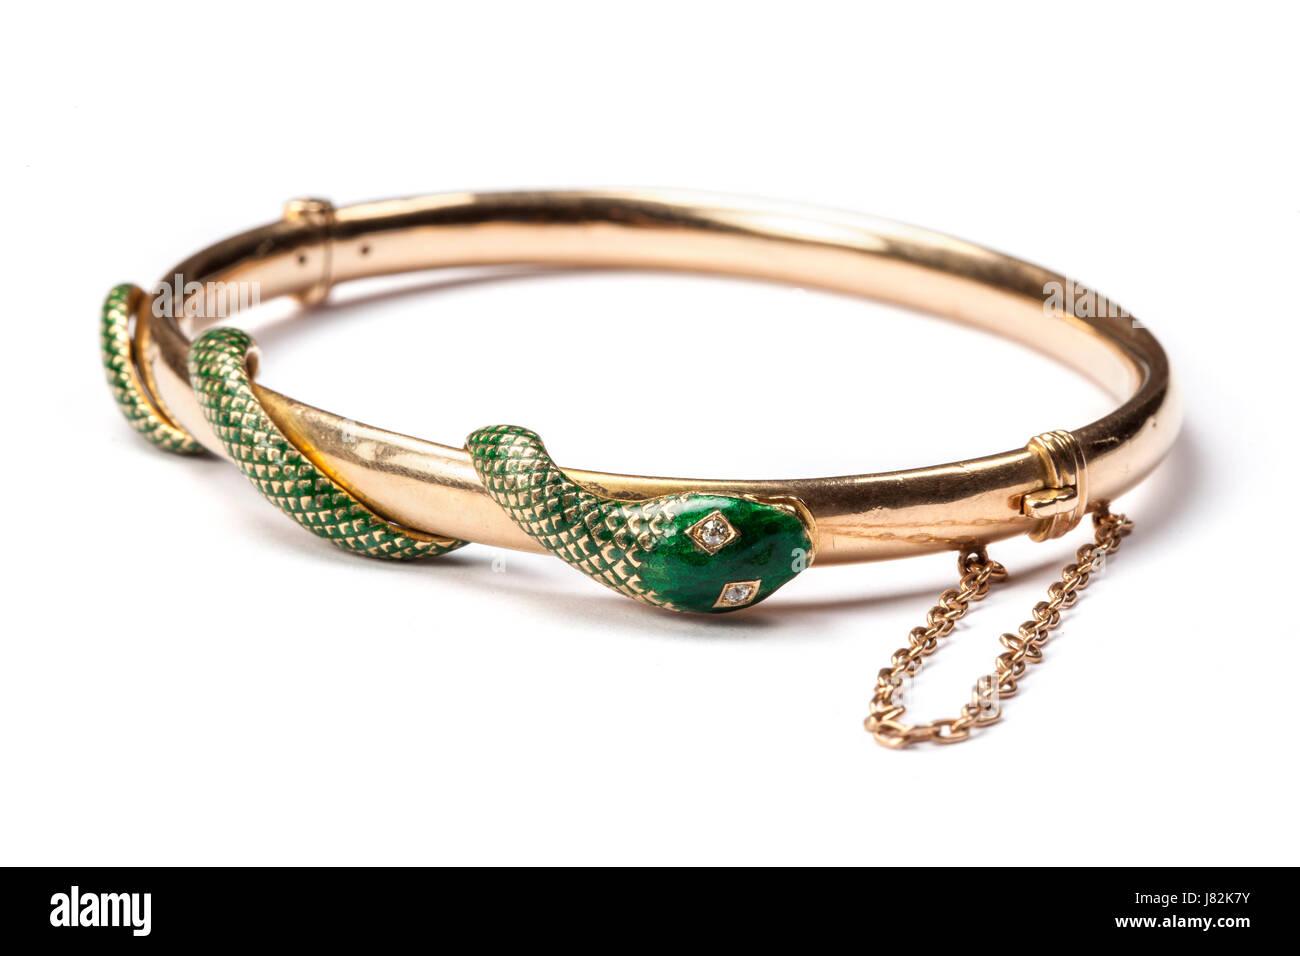 An enamelled snake entwined hinged gold bangle - Stock Image